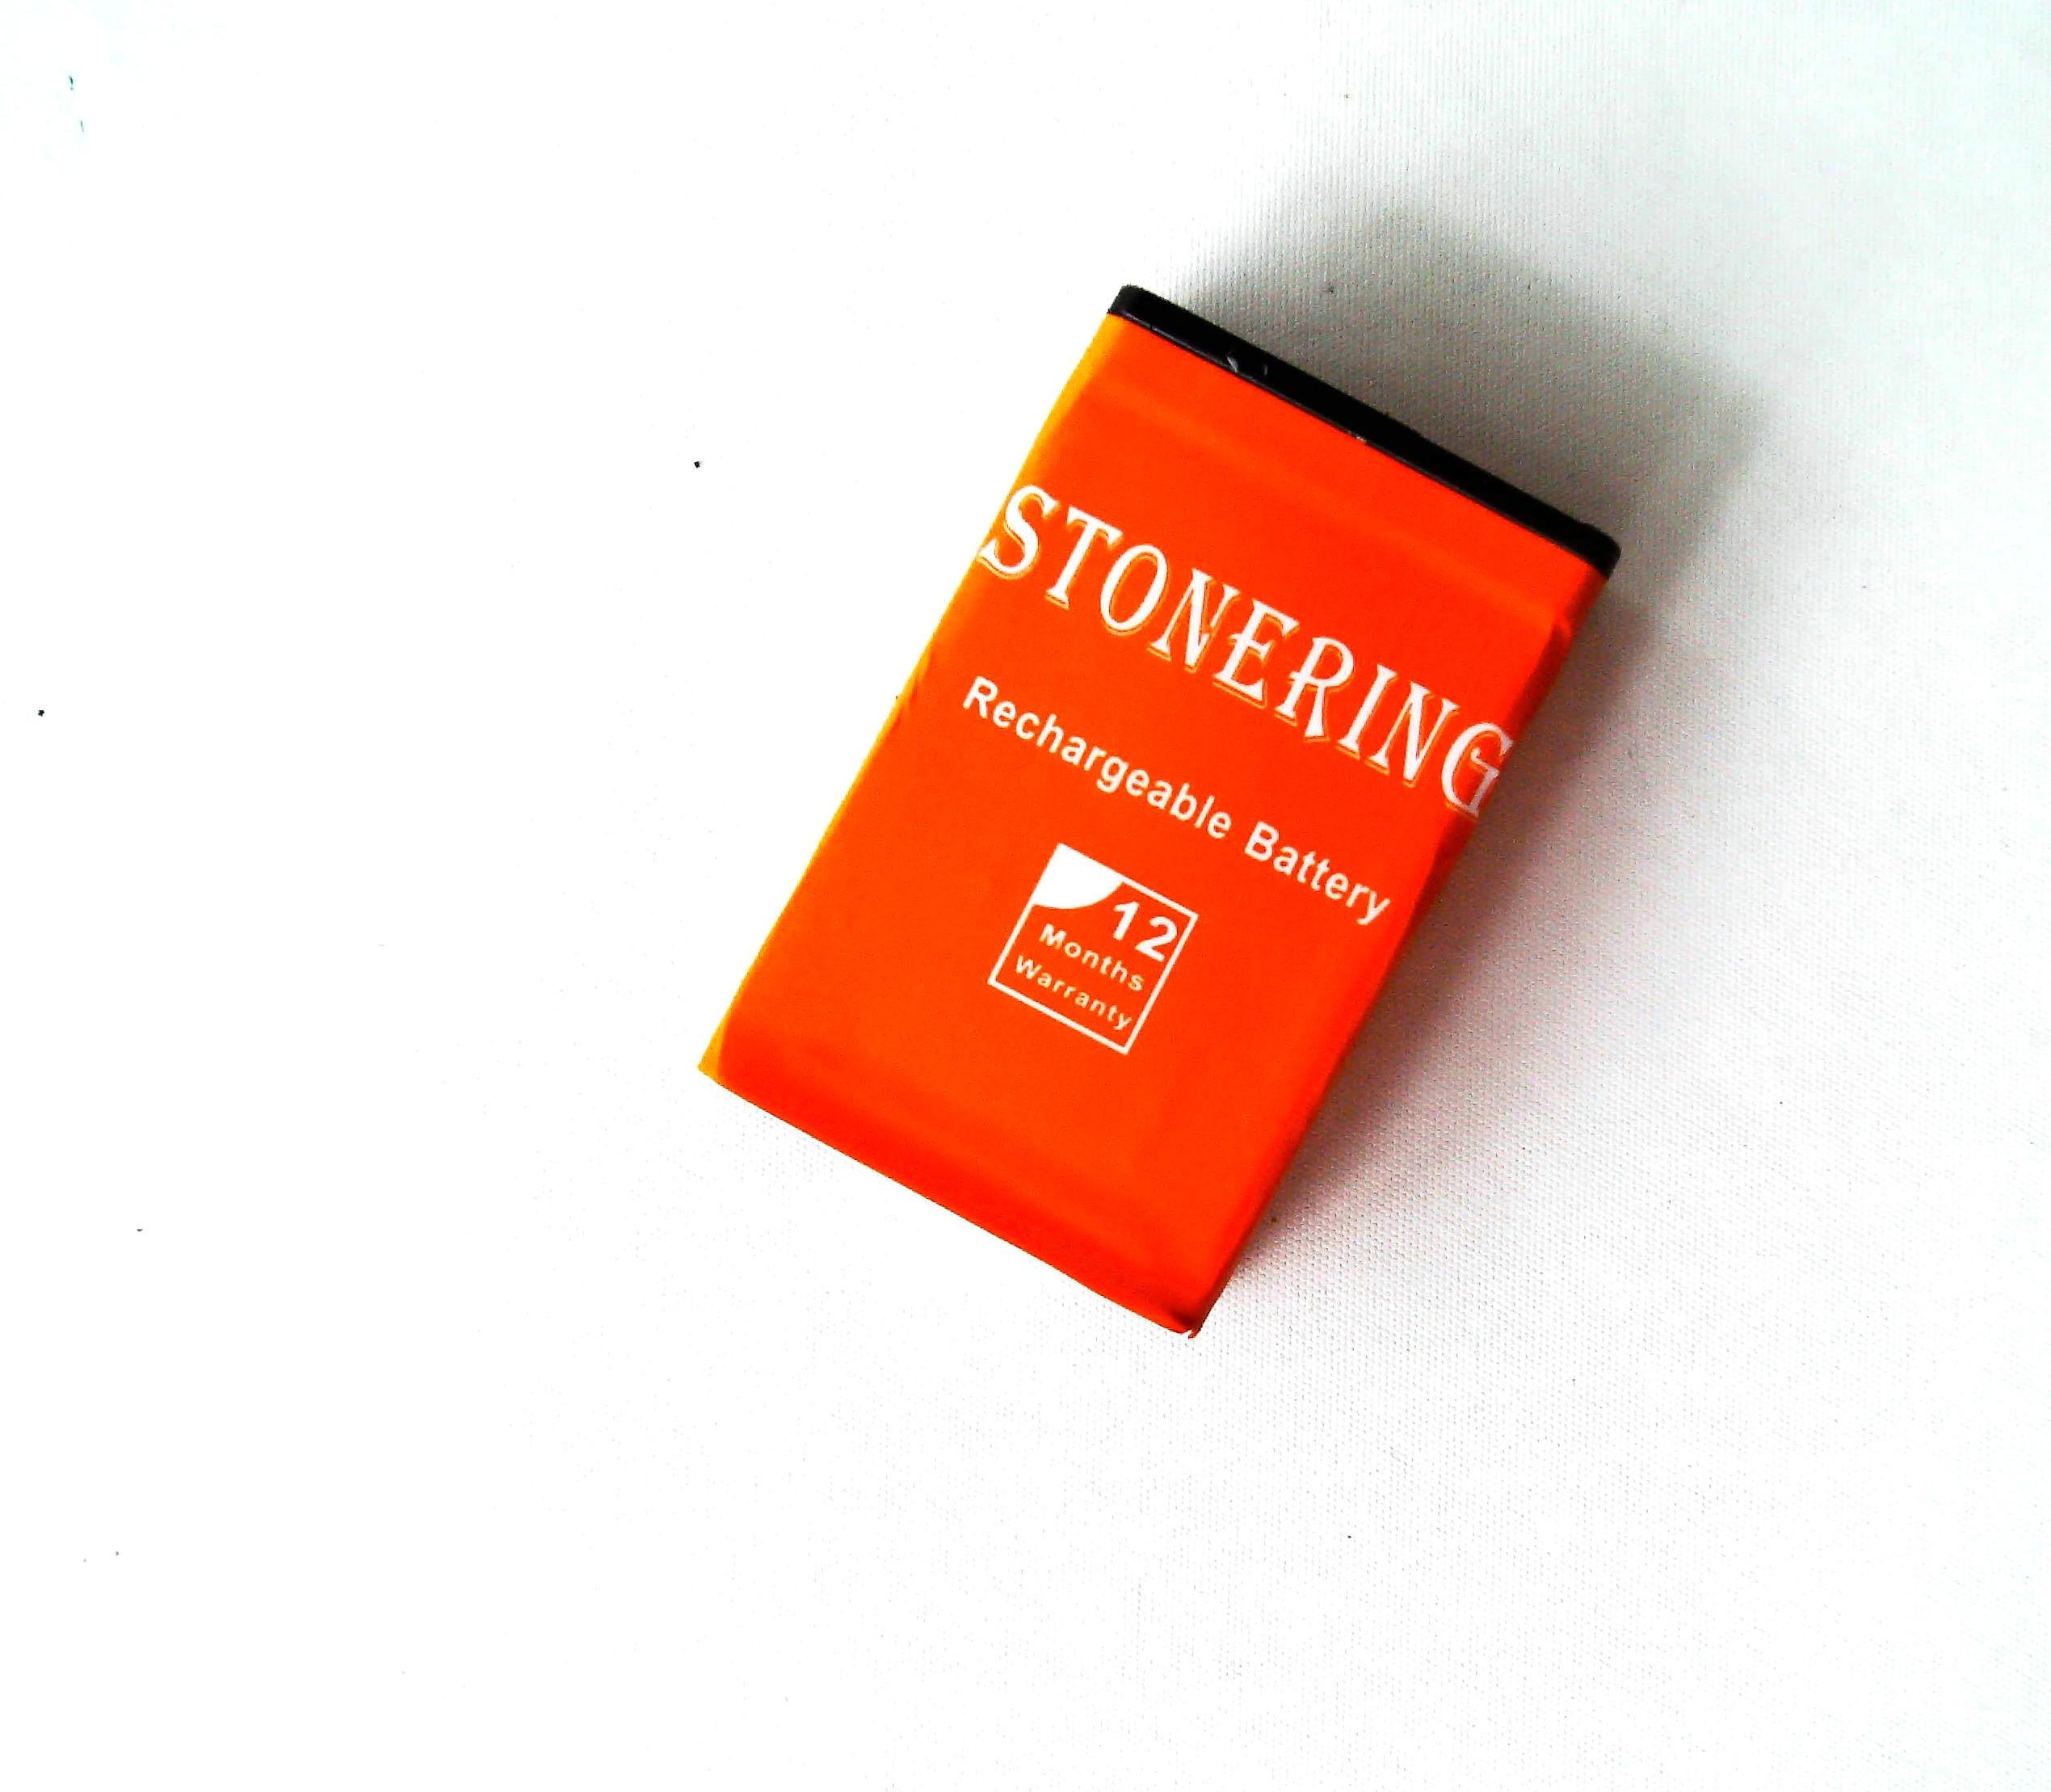 Stonering gps Navigat Батарея 2200 мАч дРя Garmin Montana 600 т 650 т 600 камуфРяж 650